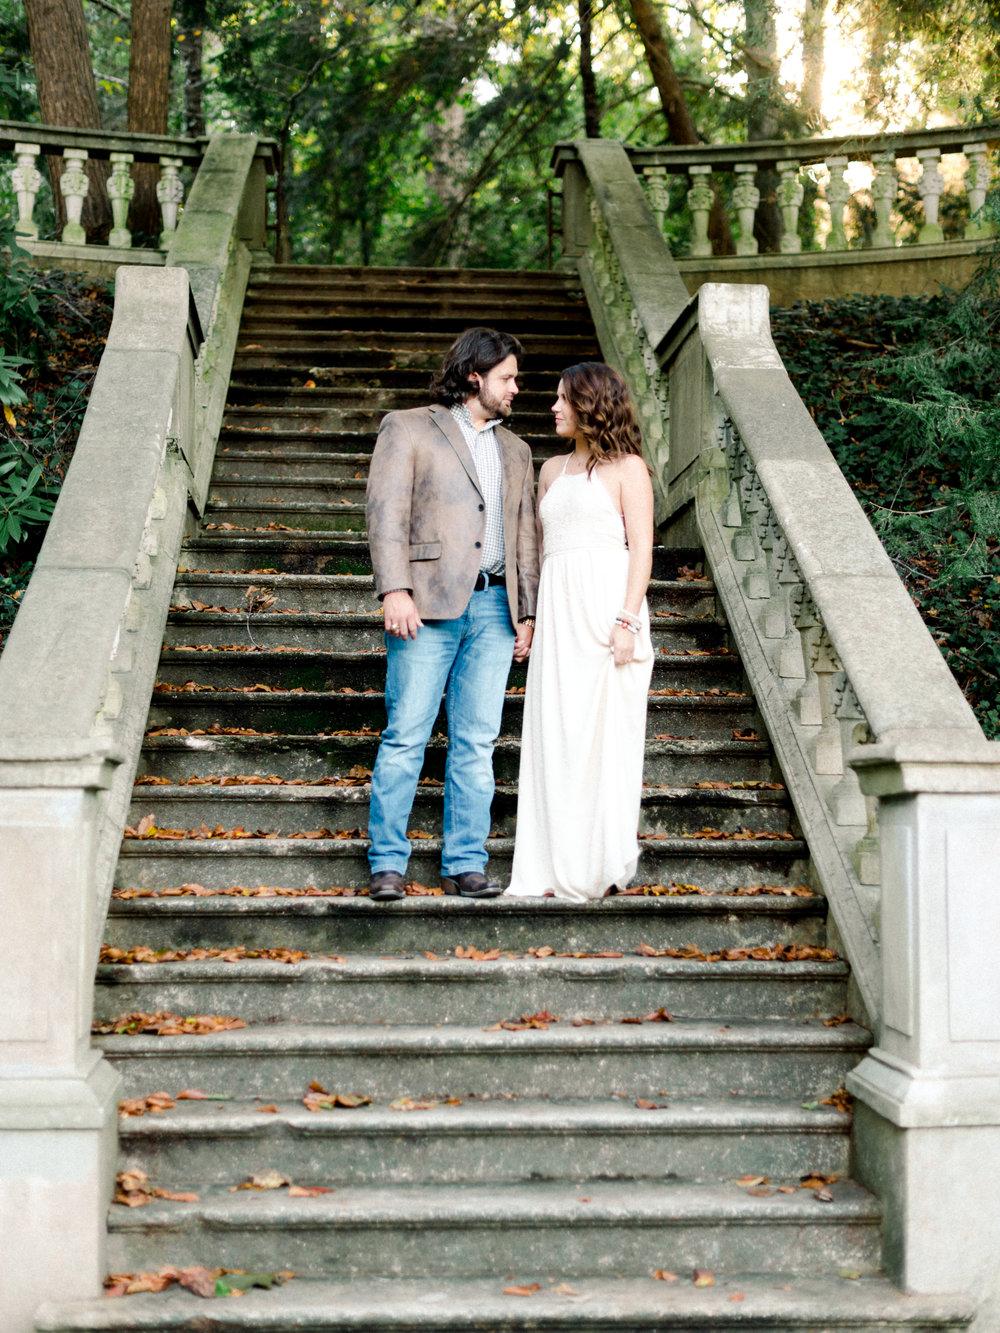 Jenna_Sam_Engagment_Cator_Woolford_Gardens_Atlanta_Georgia_Fallen_Photography-8.JPG